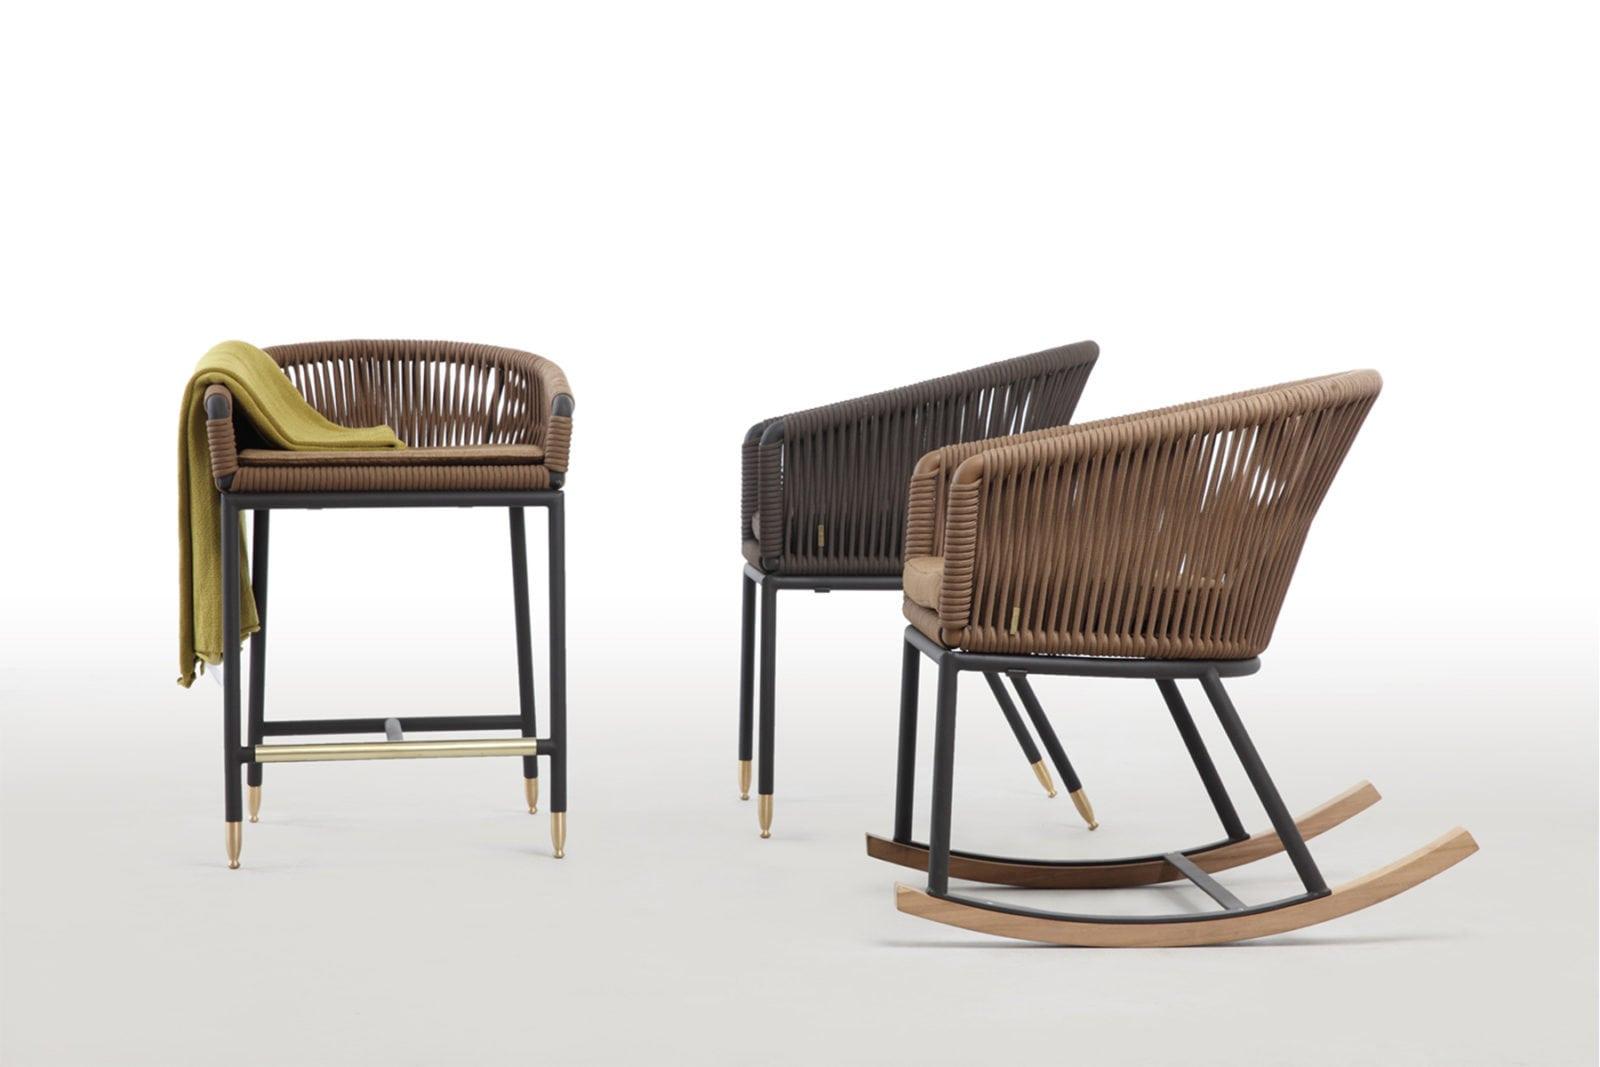 Lebello Chair 7 Rocking Chair – STATEMENT iD